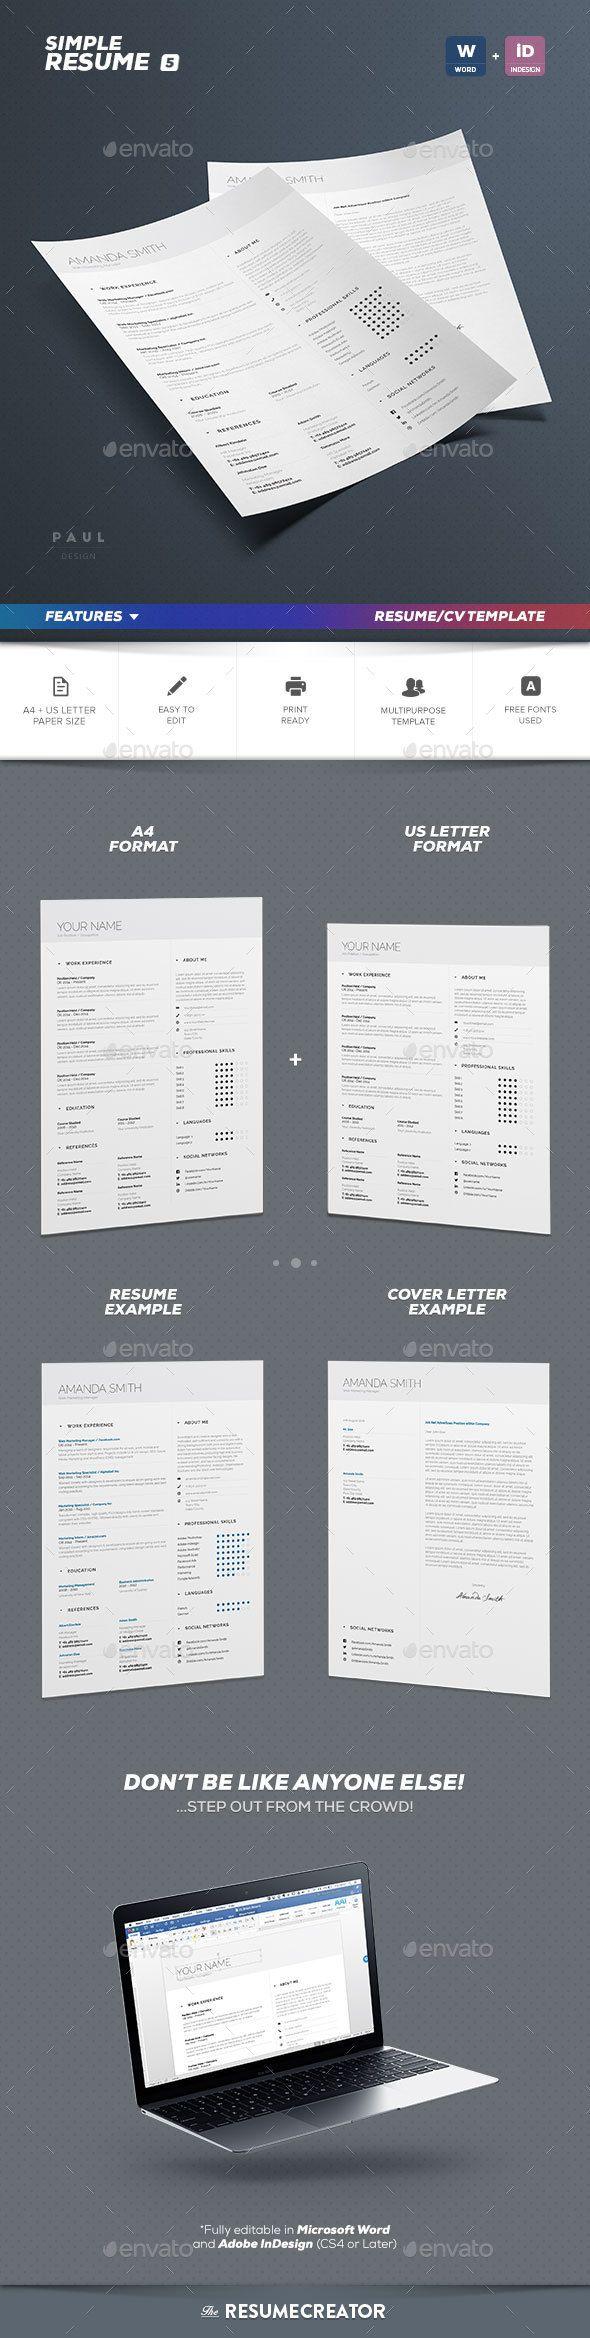 Simple Resume Cv Volume 5